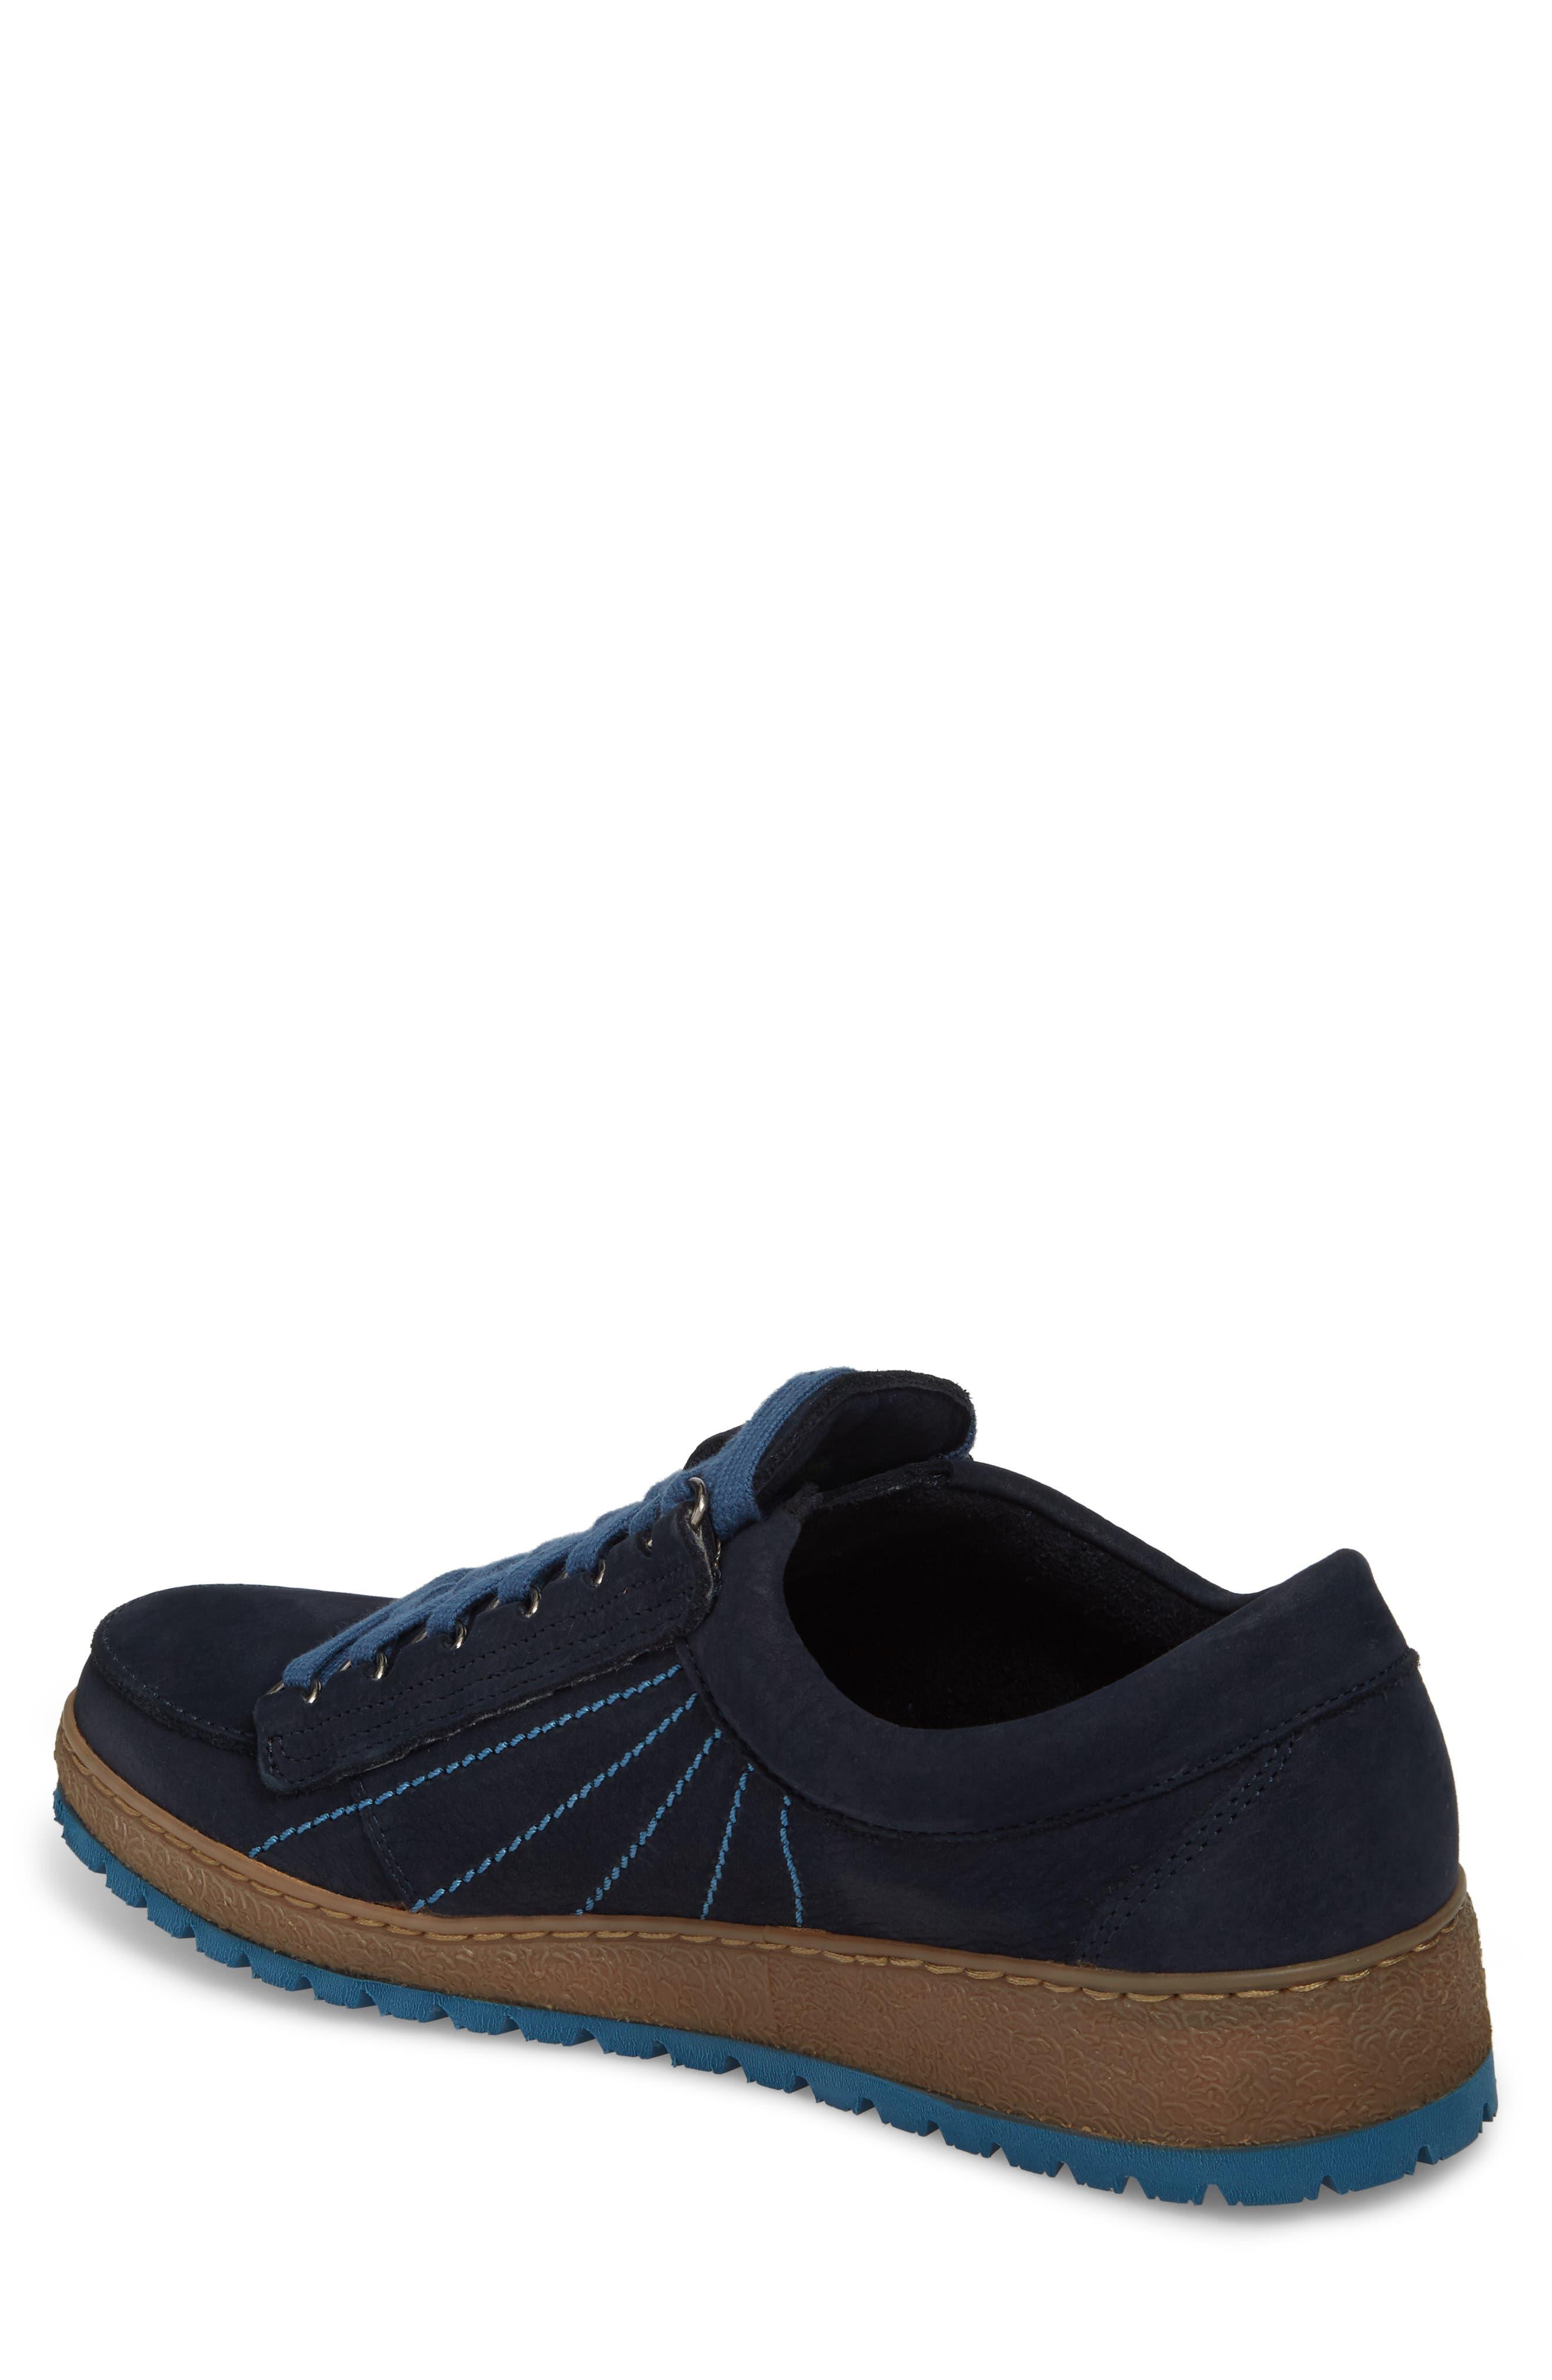 Rainbow Sneaker,                             Alternate thumbnail 2, color,                             NAVY BLUE SUEDE